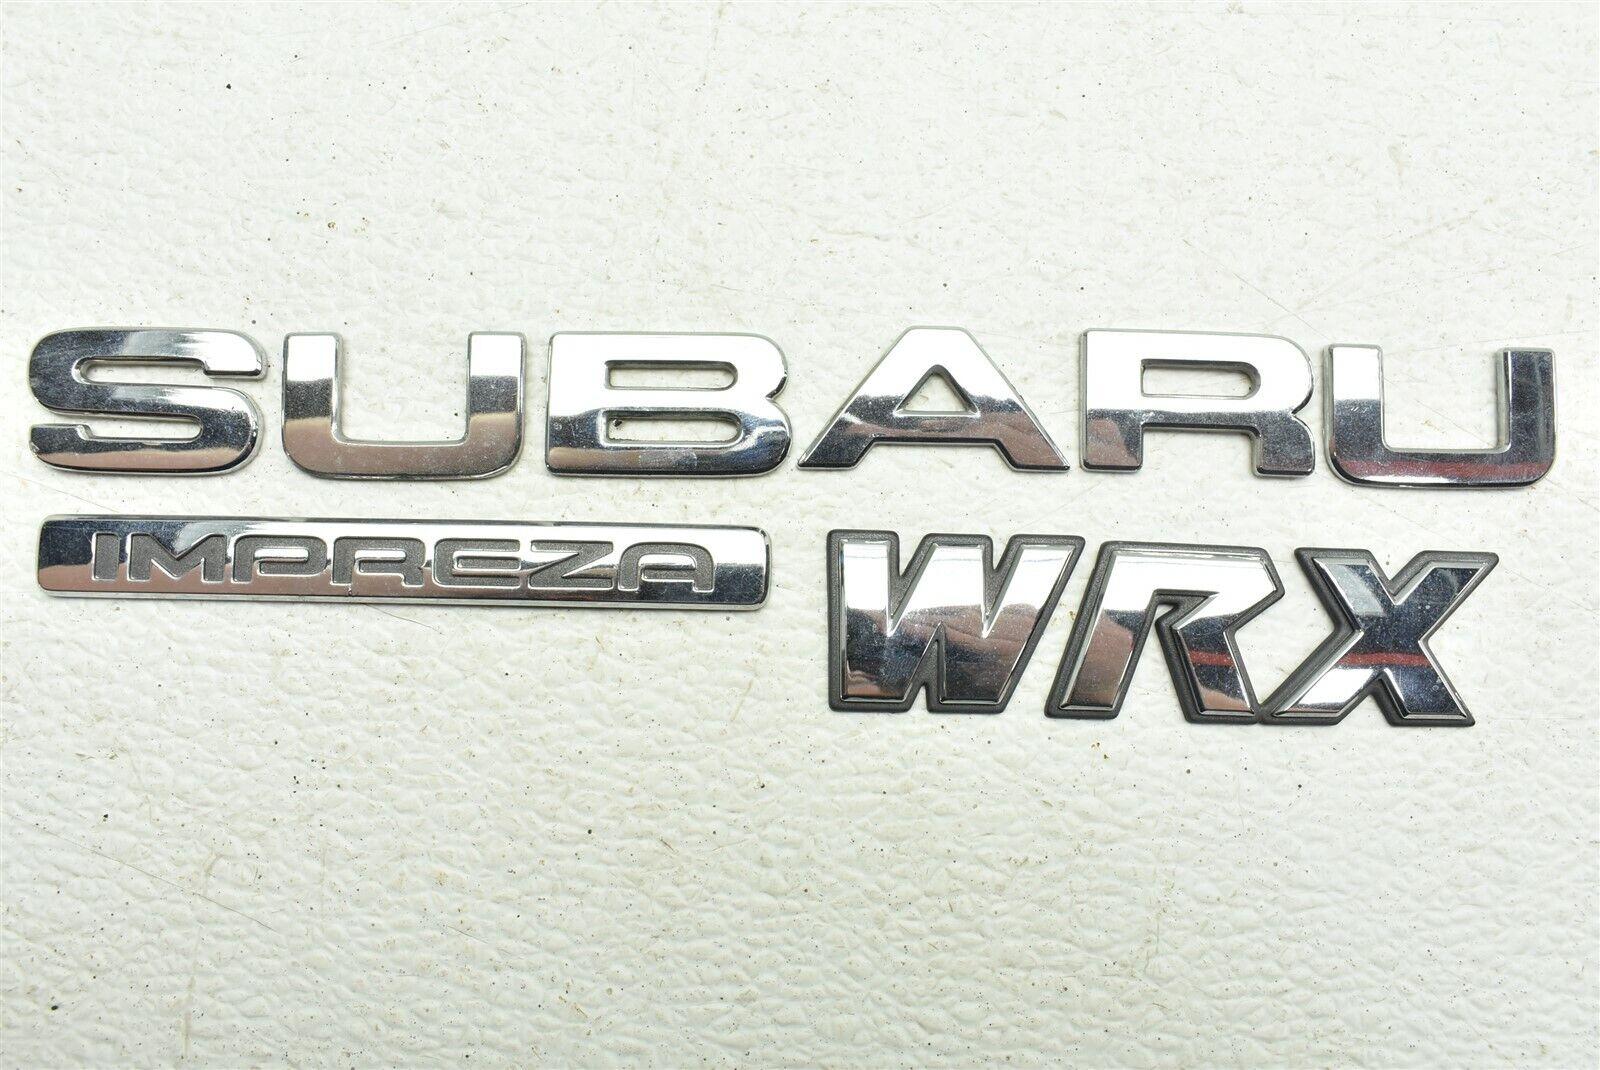 2002-2007 Subaru Impreza WRX Badge Emblem Decal 02-07 | eBay